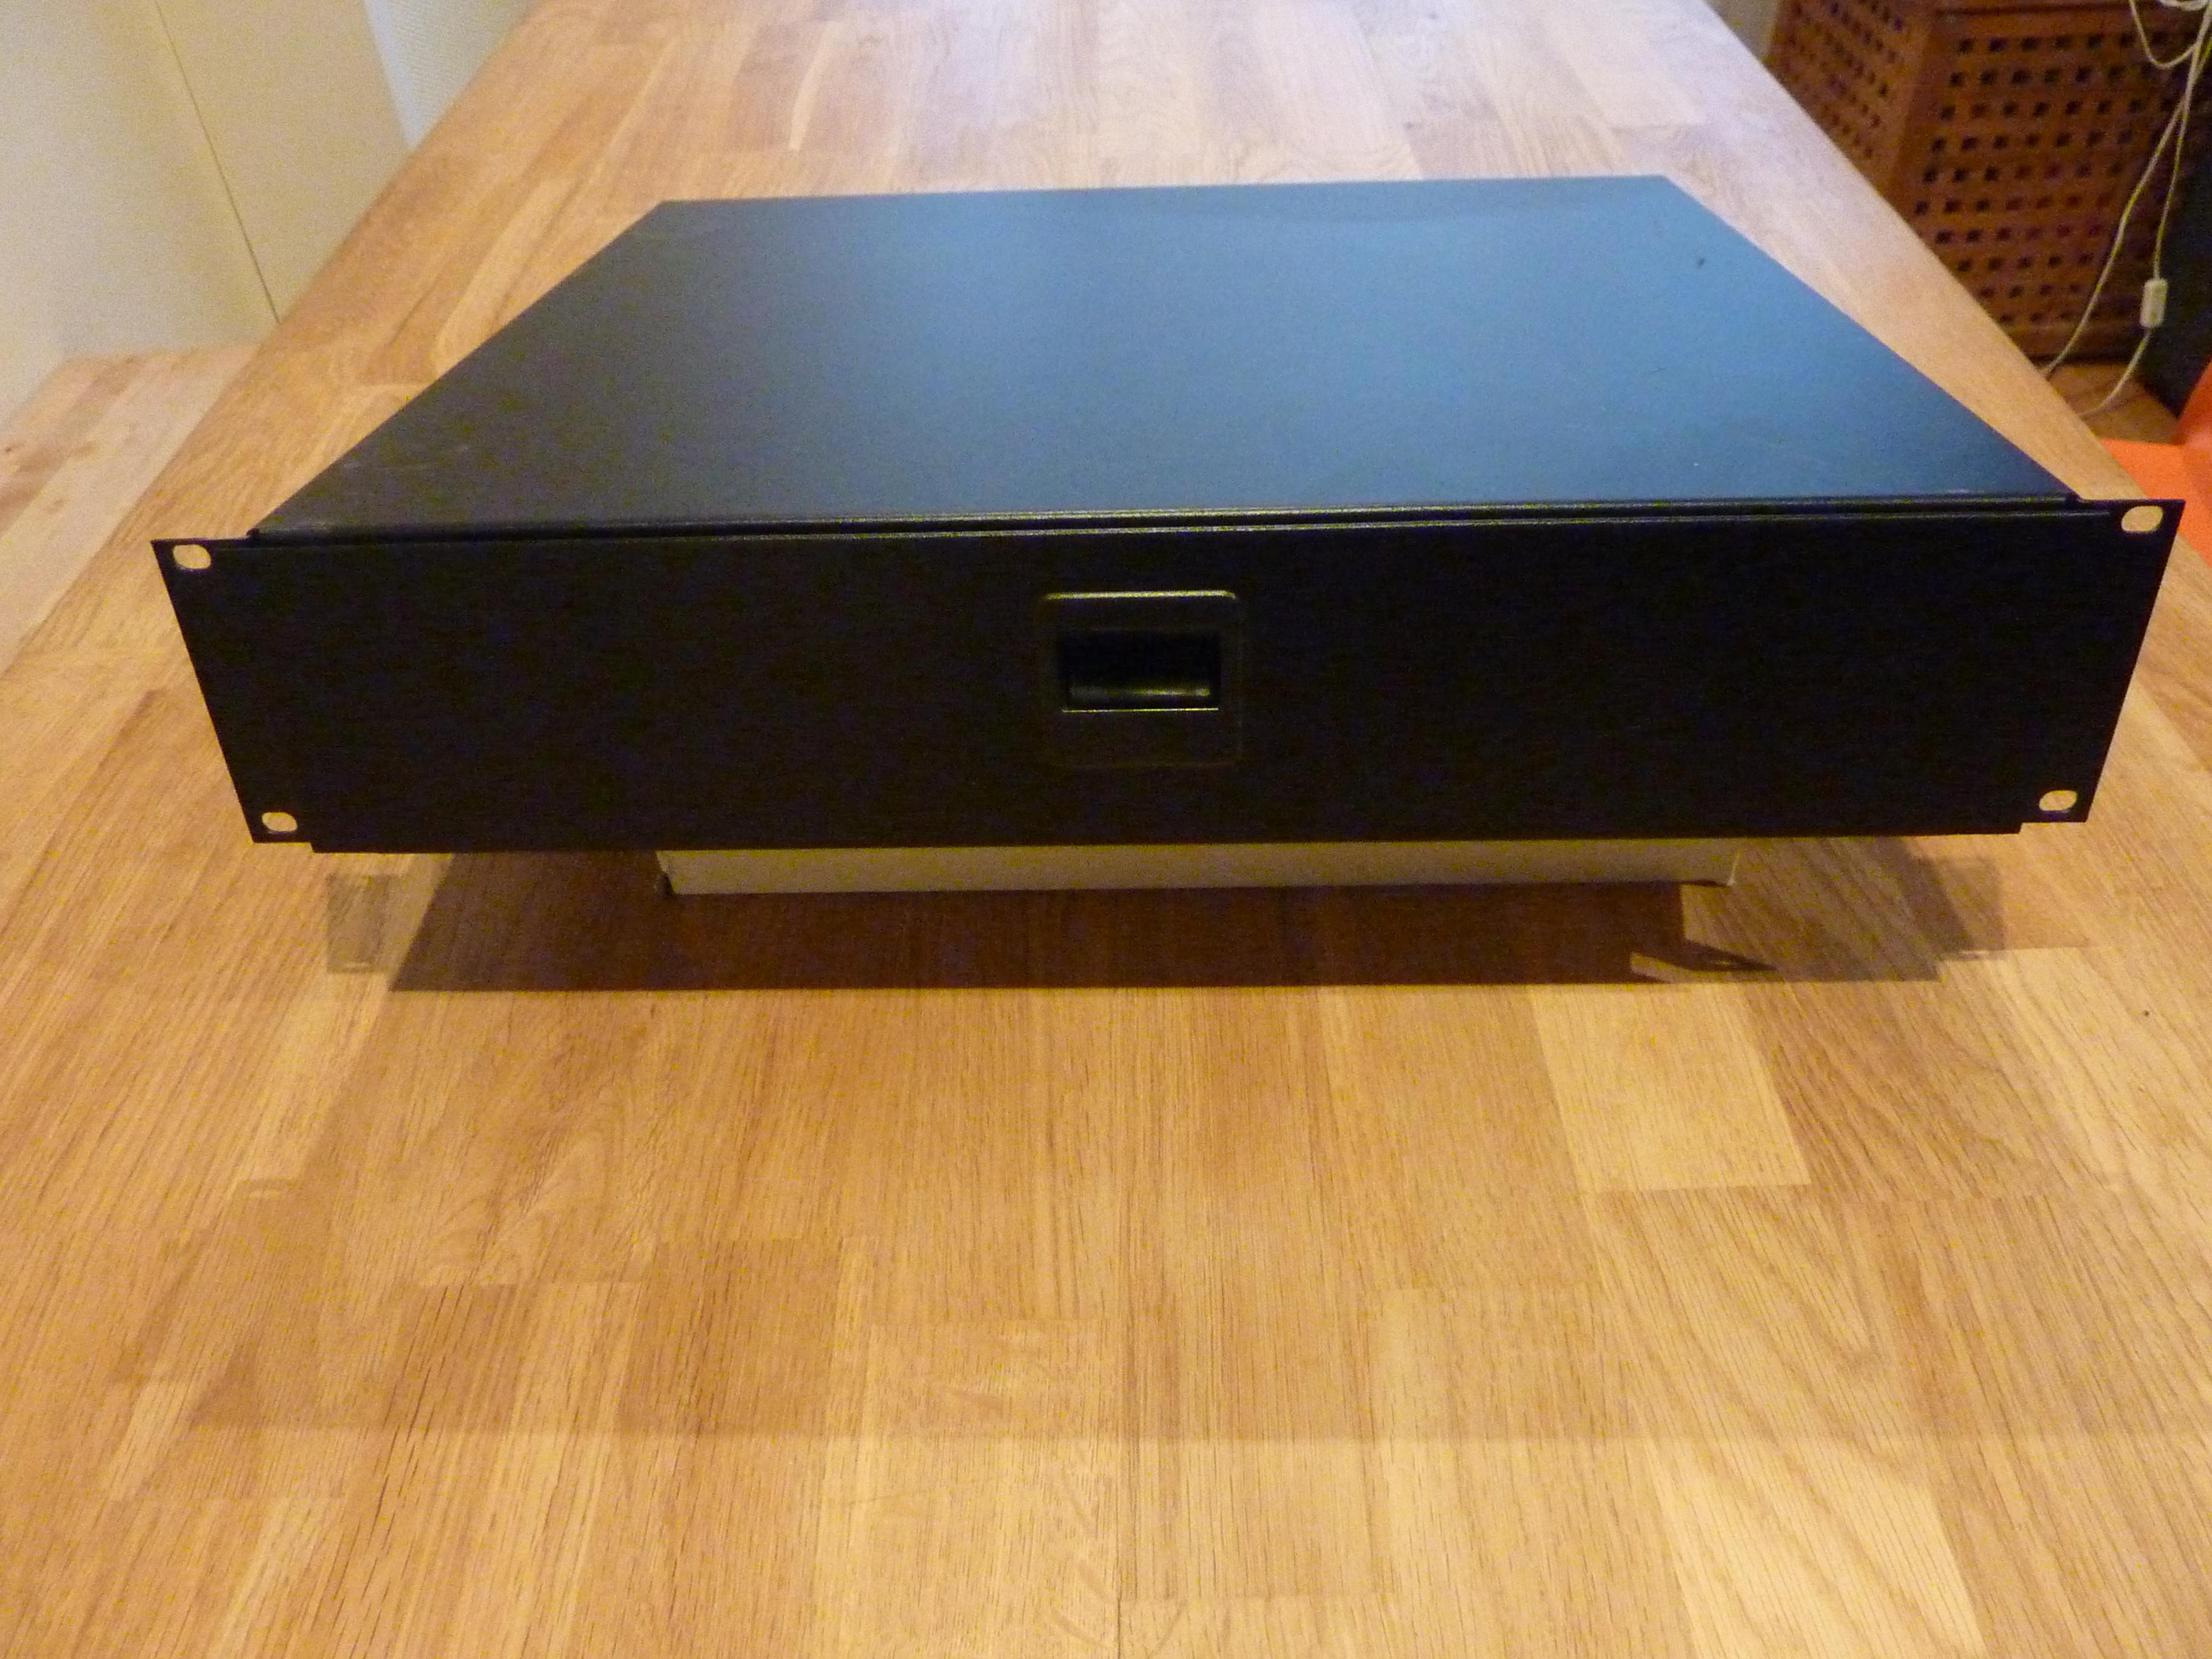 photo thon rack drawer 2u thon rack drawer 2u 38485 2105128 audiofanzine. Black Bedroom Furniture Sets. Home Design Ideas